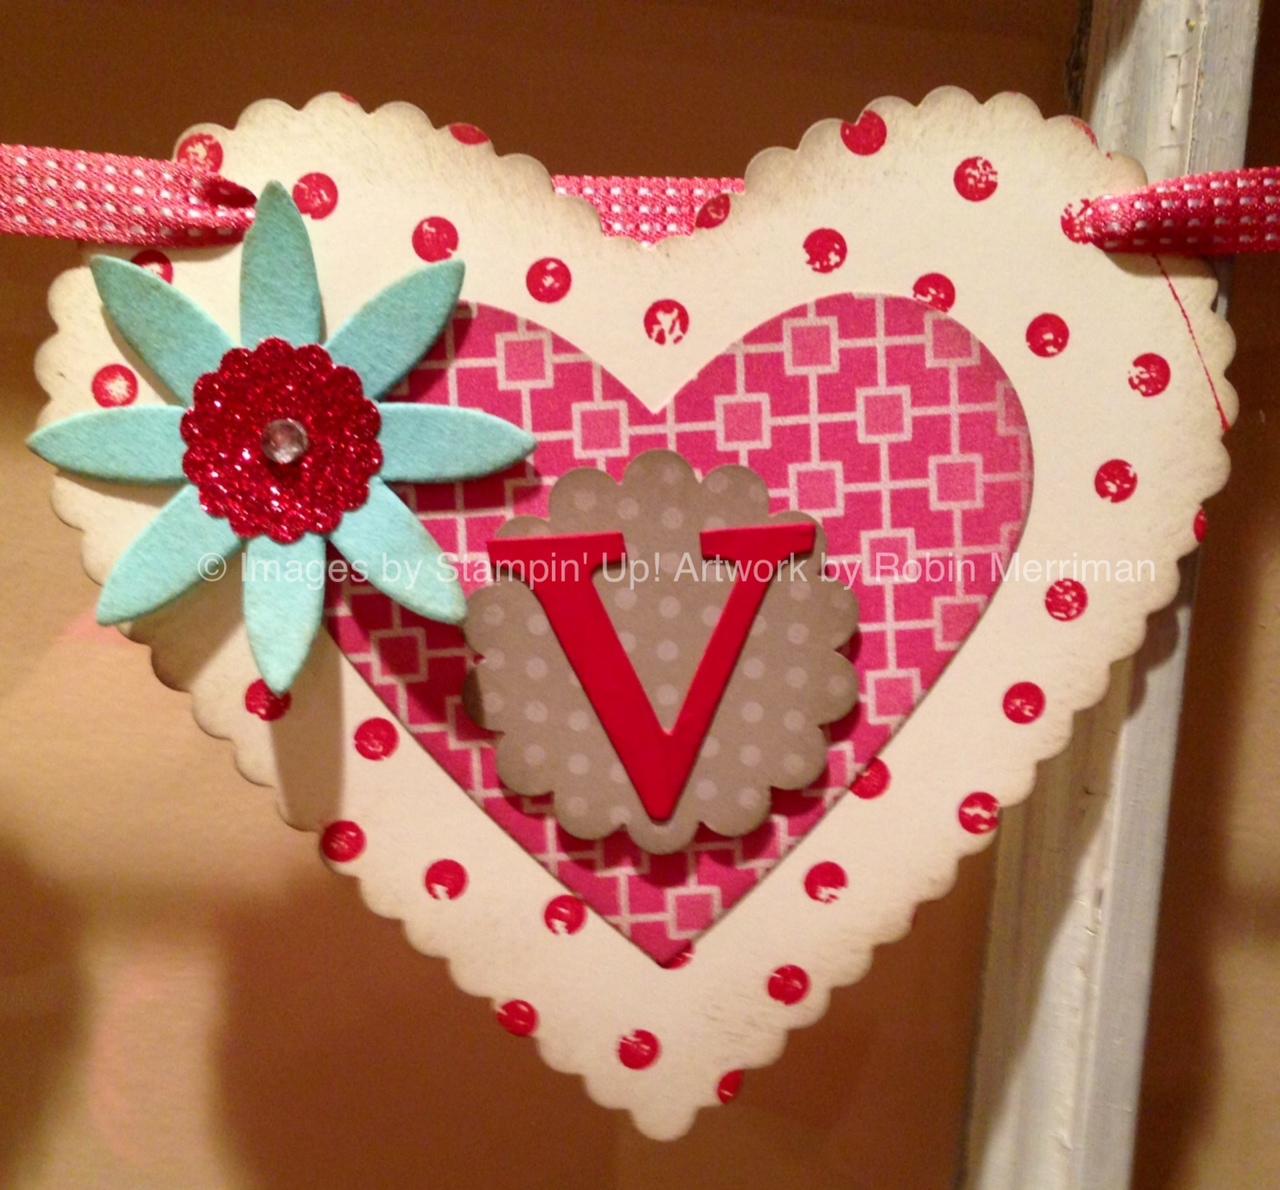 Alphabet Wallpaper in Heart Alphabet v And r in Heart